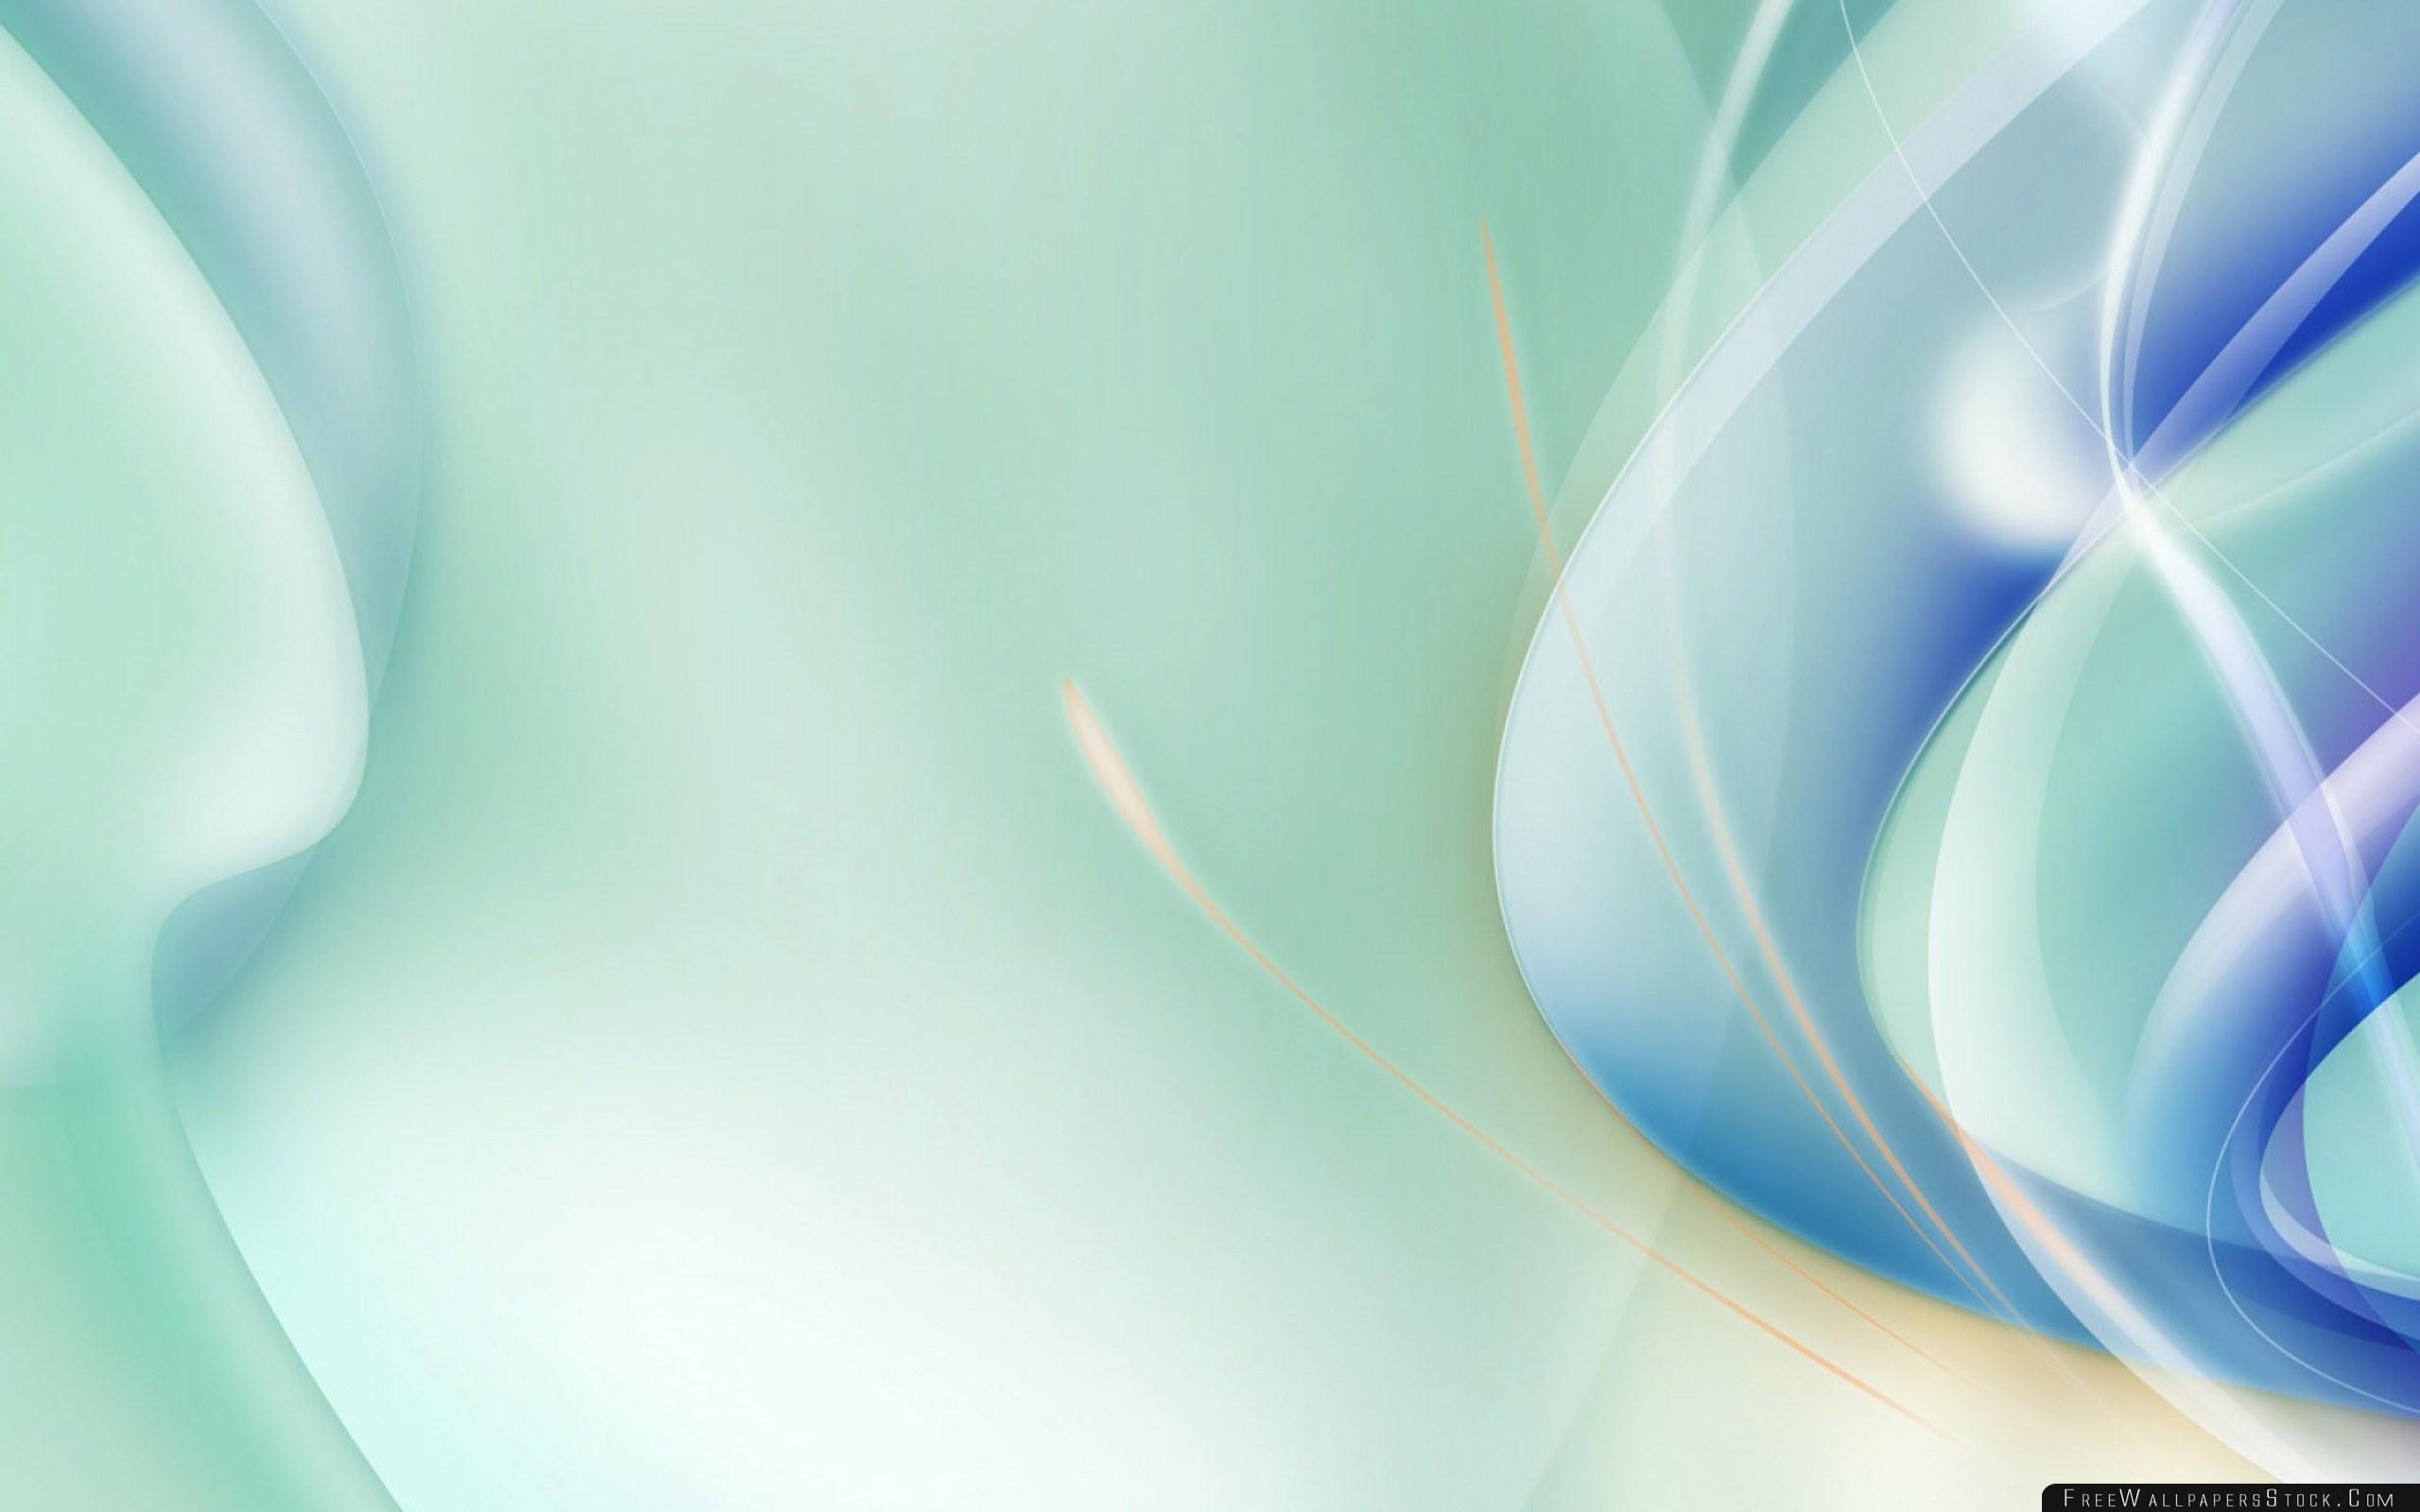 Download Free Wallpaper Background Light Lines Spots